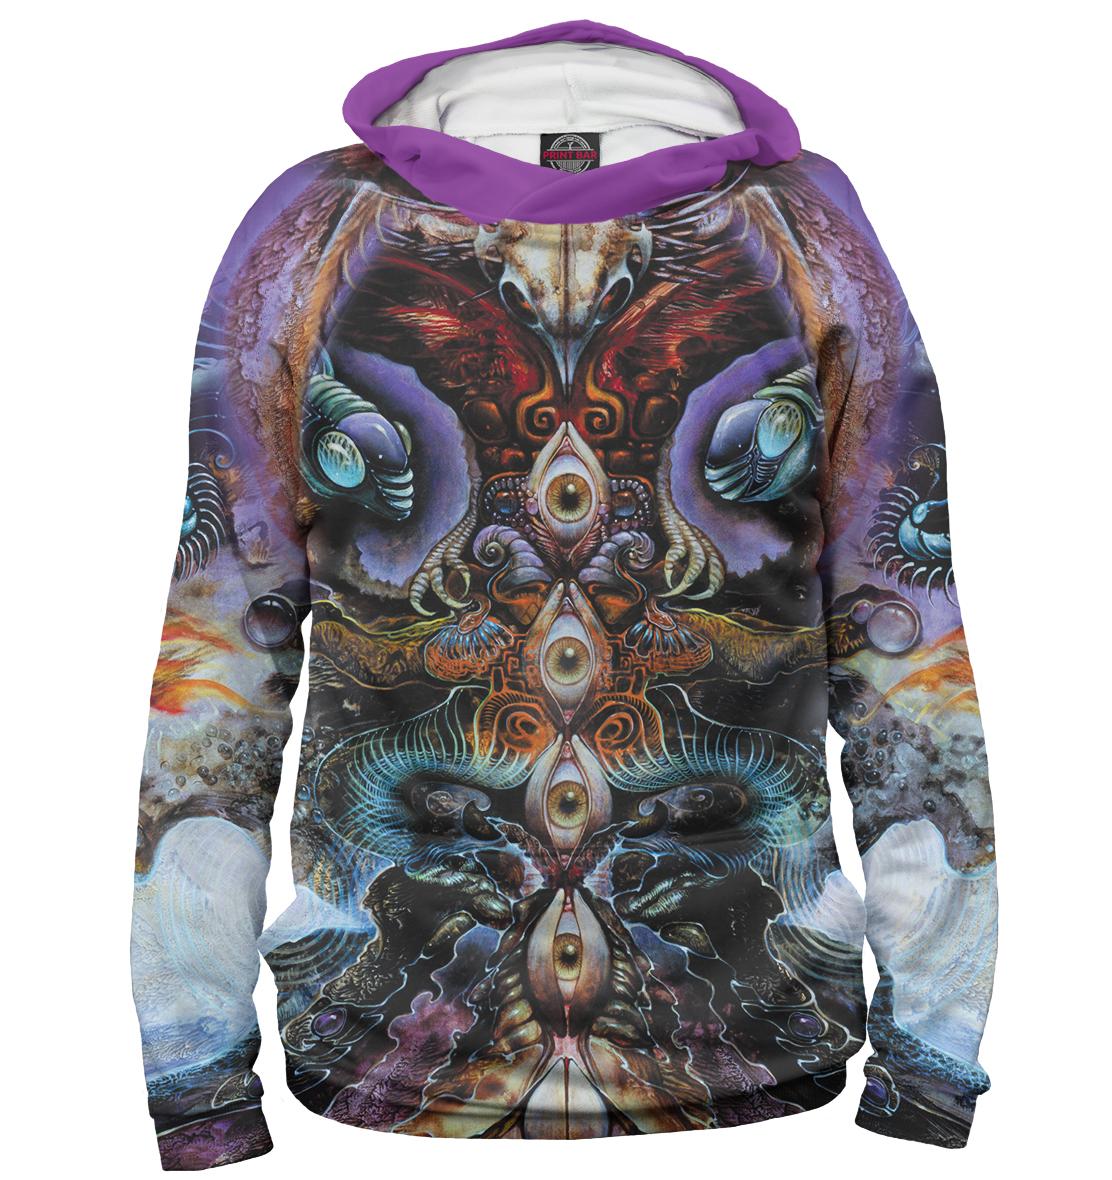 Купить Psychedelic, Printbar, Худи, PSY-635259-hud-1